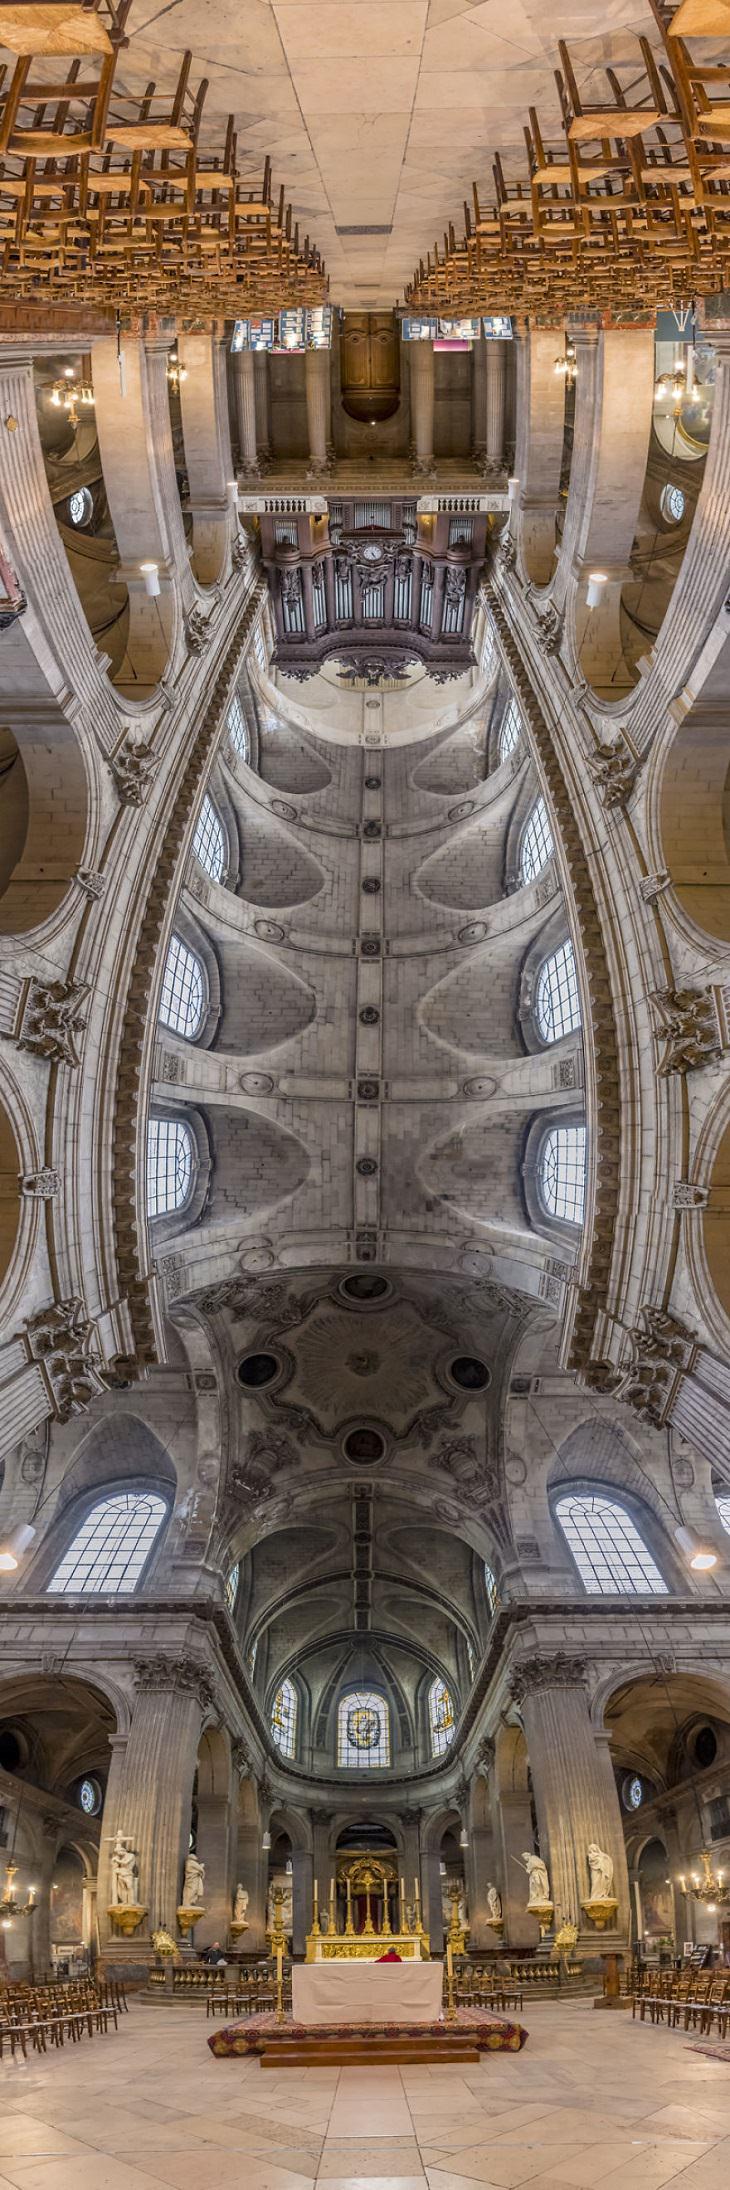 כנסיות בפריז: כנסיית סן-סולפיס